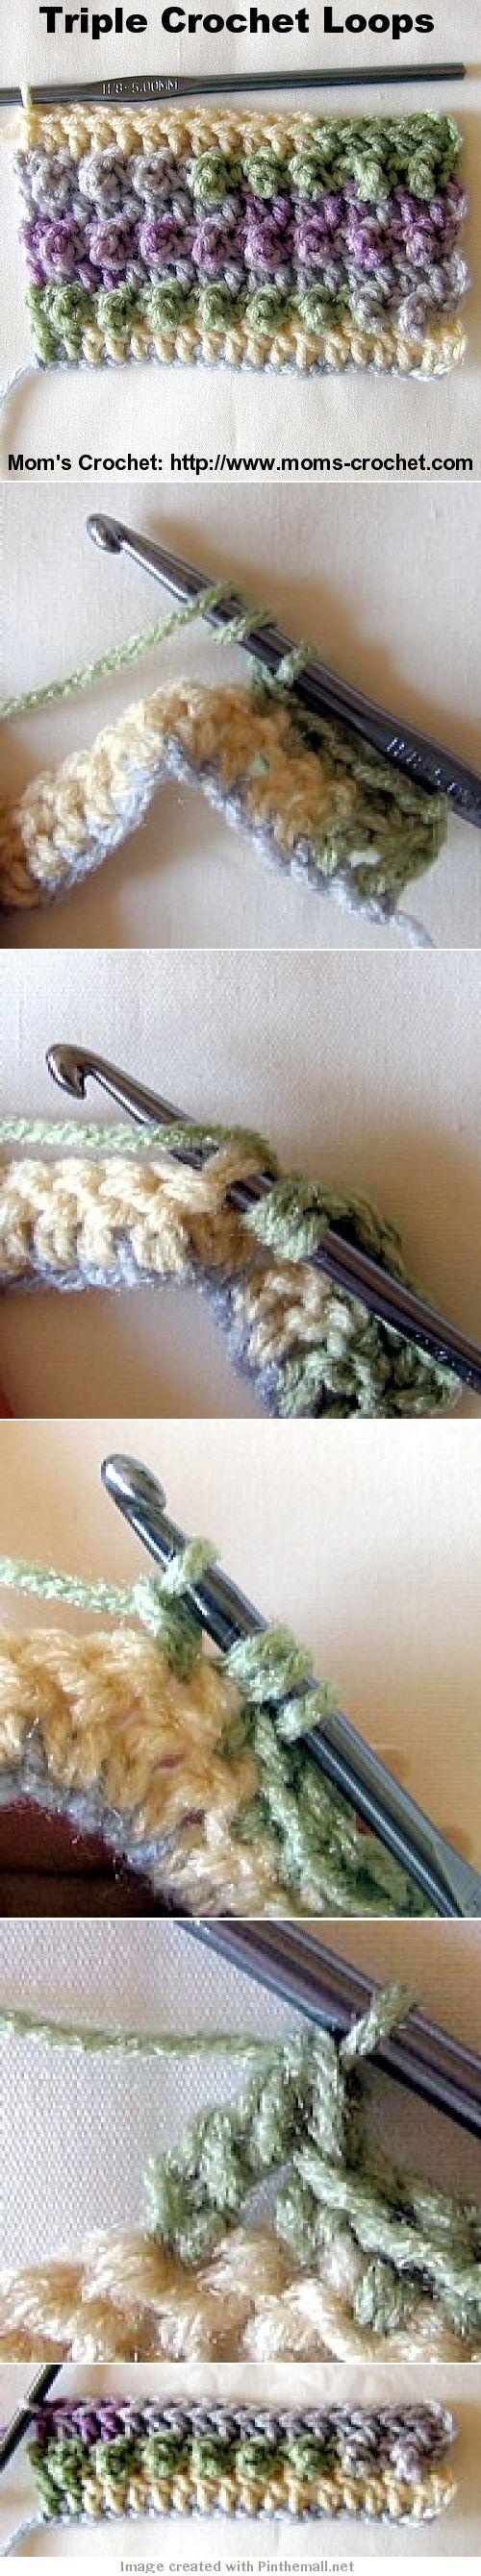 Crochet Triple Loops.Stitch - Tutorial ❥ 4U // hf  http://www.pinterest.com/hilariafina/